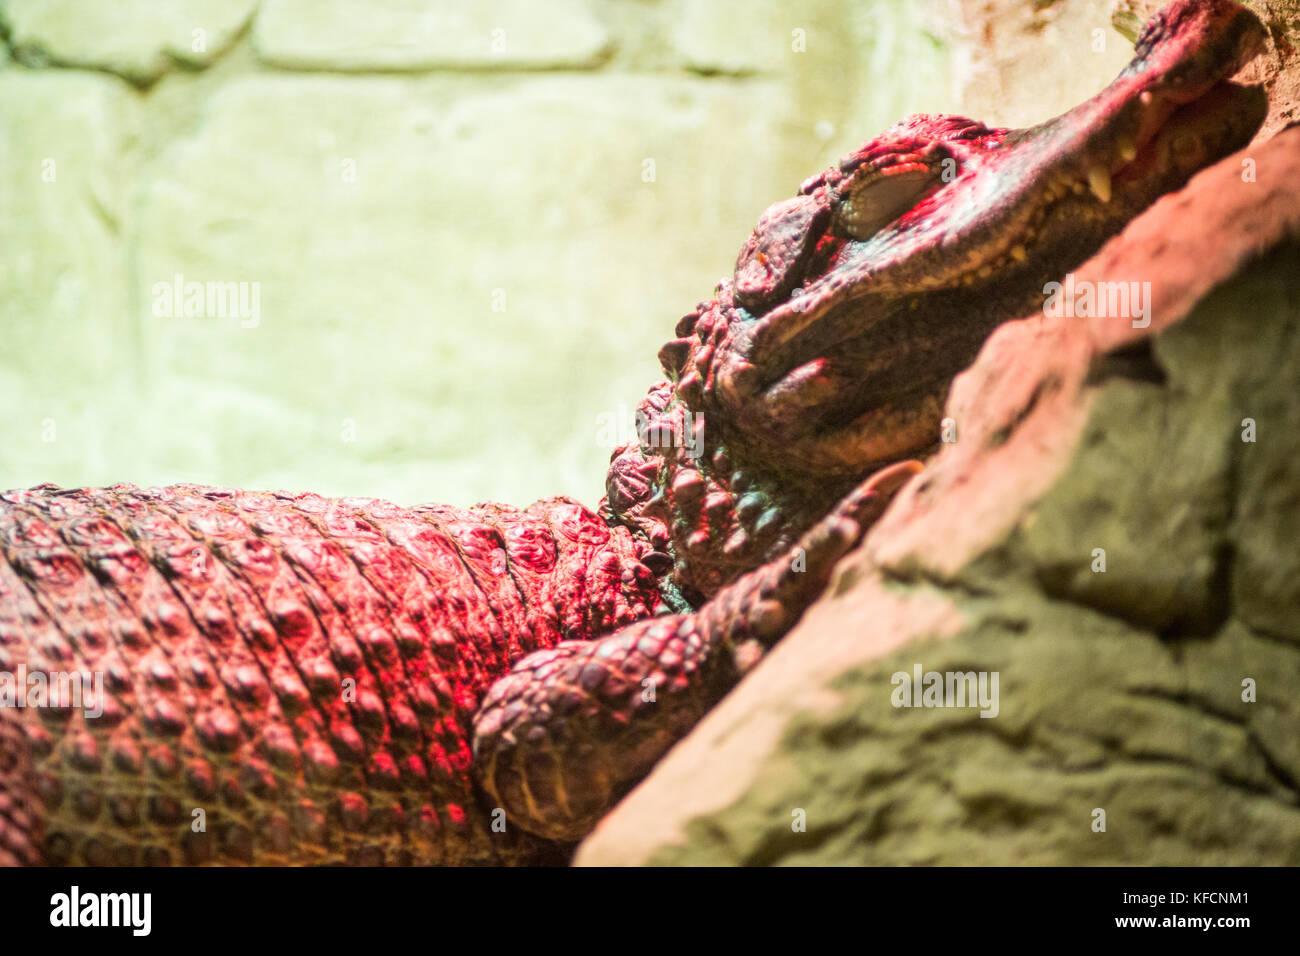 Spectacled caiman, Caiman crocodilus, single animal head shot under an infrared lamp , Brazil - Stock Image